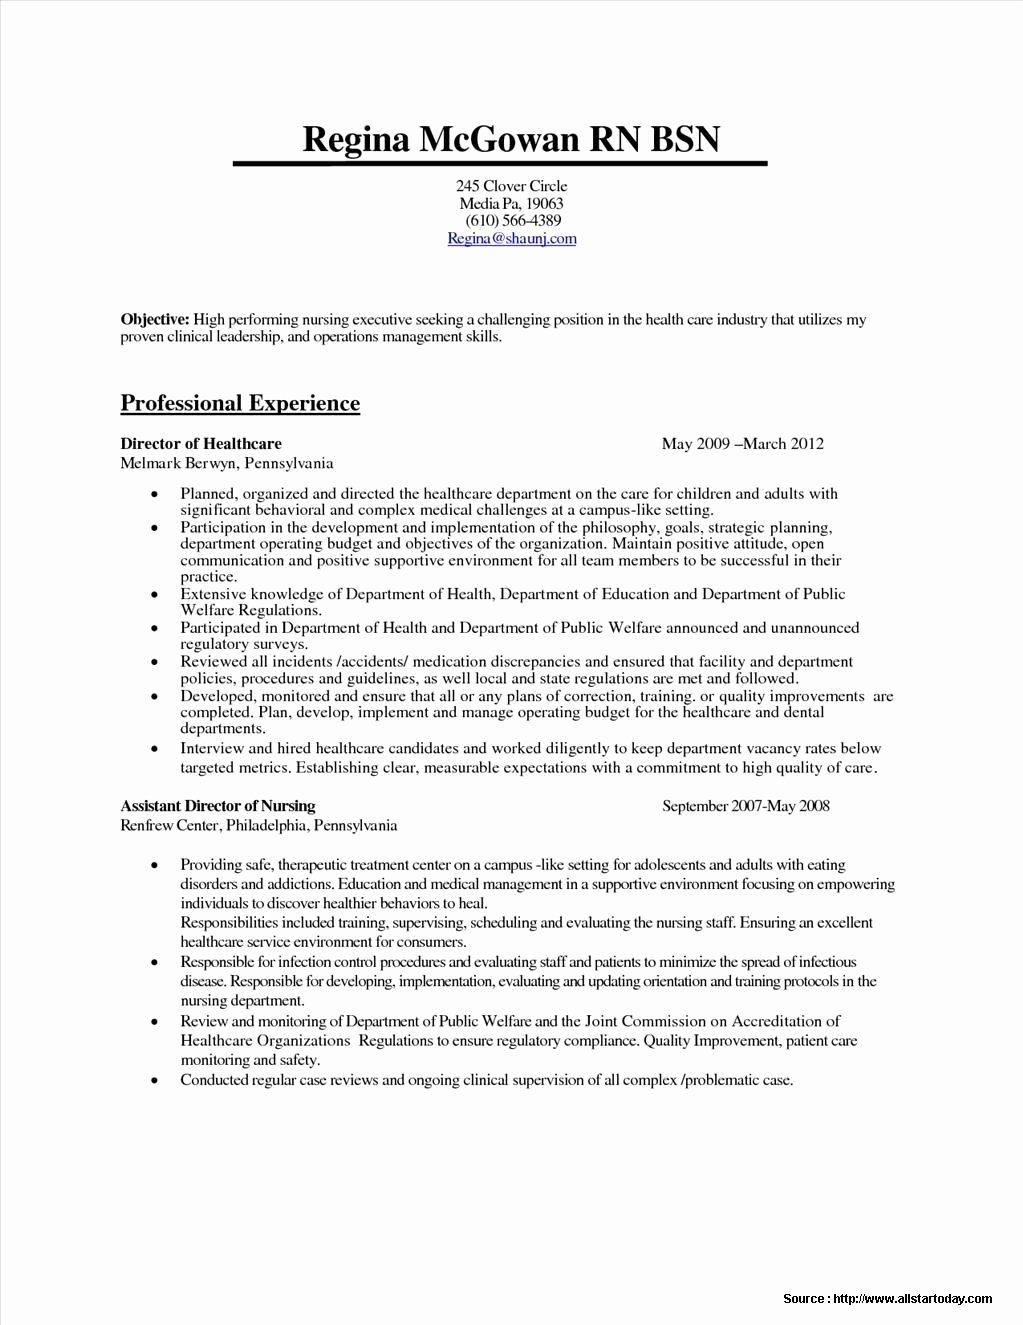 Sample Resume for Rn Bsn Resume Resume Examples